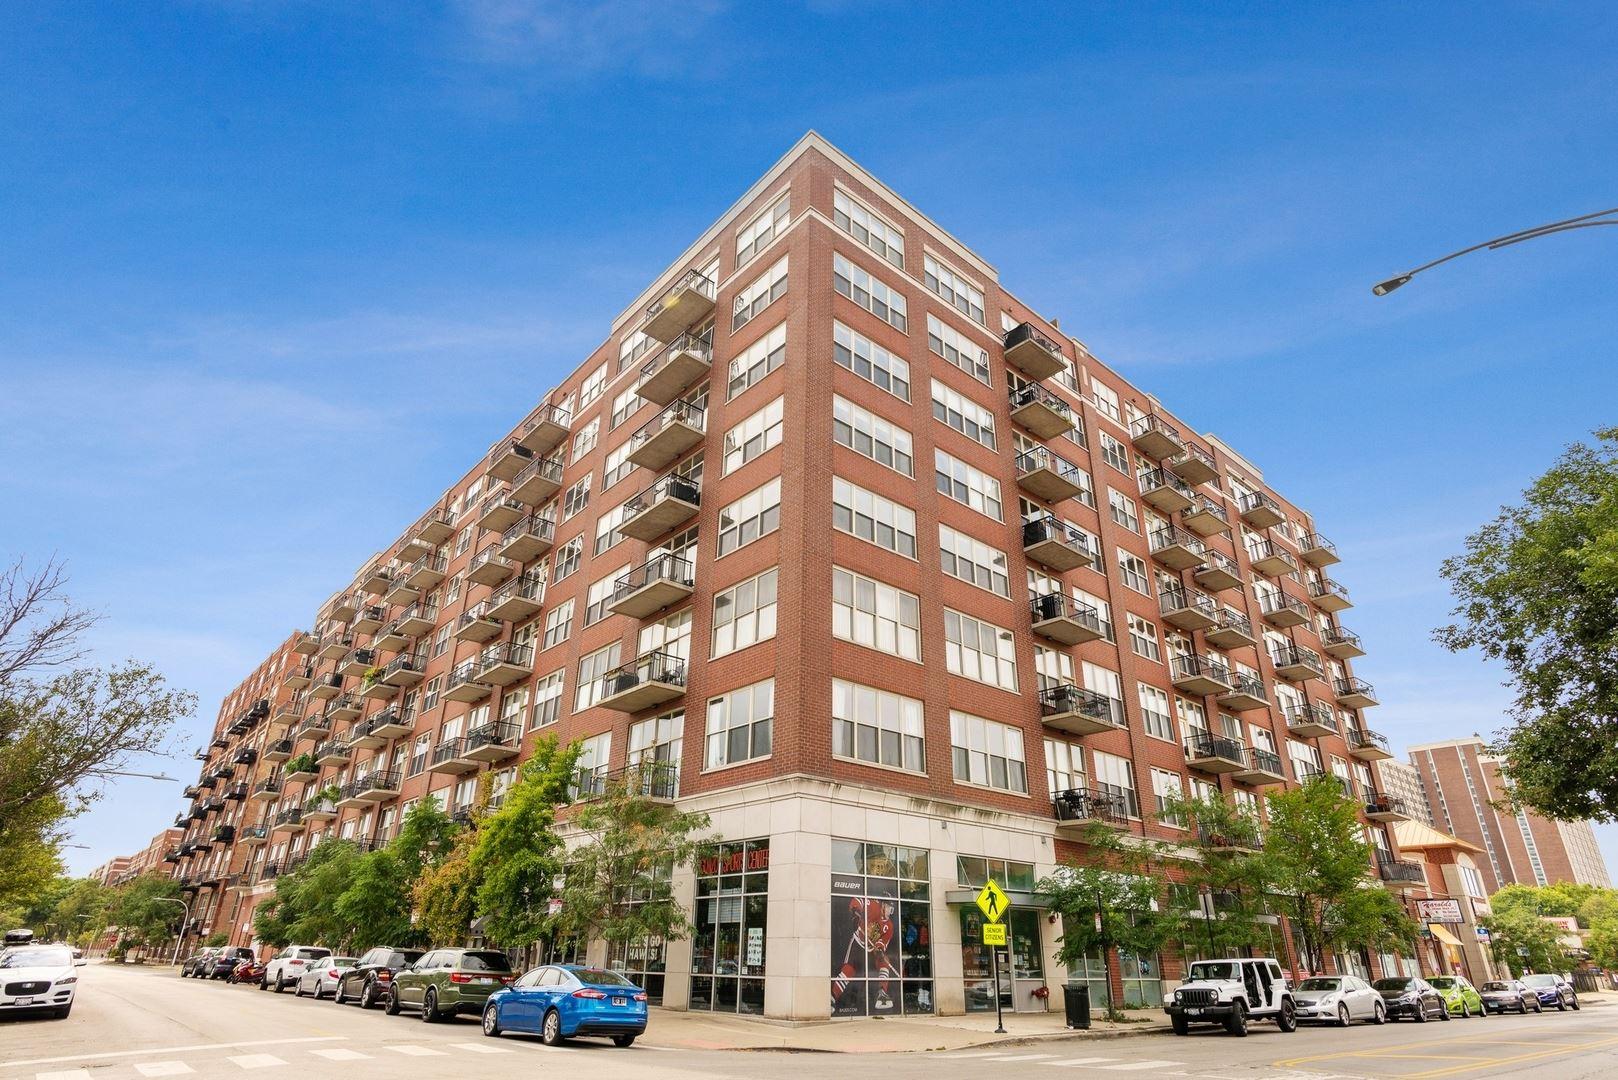 6 S Laflin Street #606S, Chicago, IL 60607 - #: 11220786